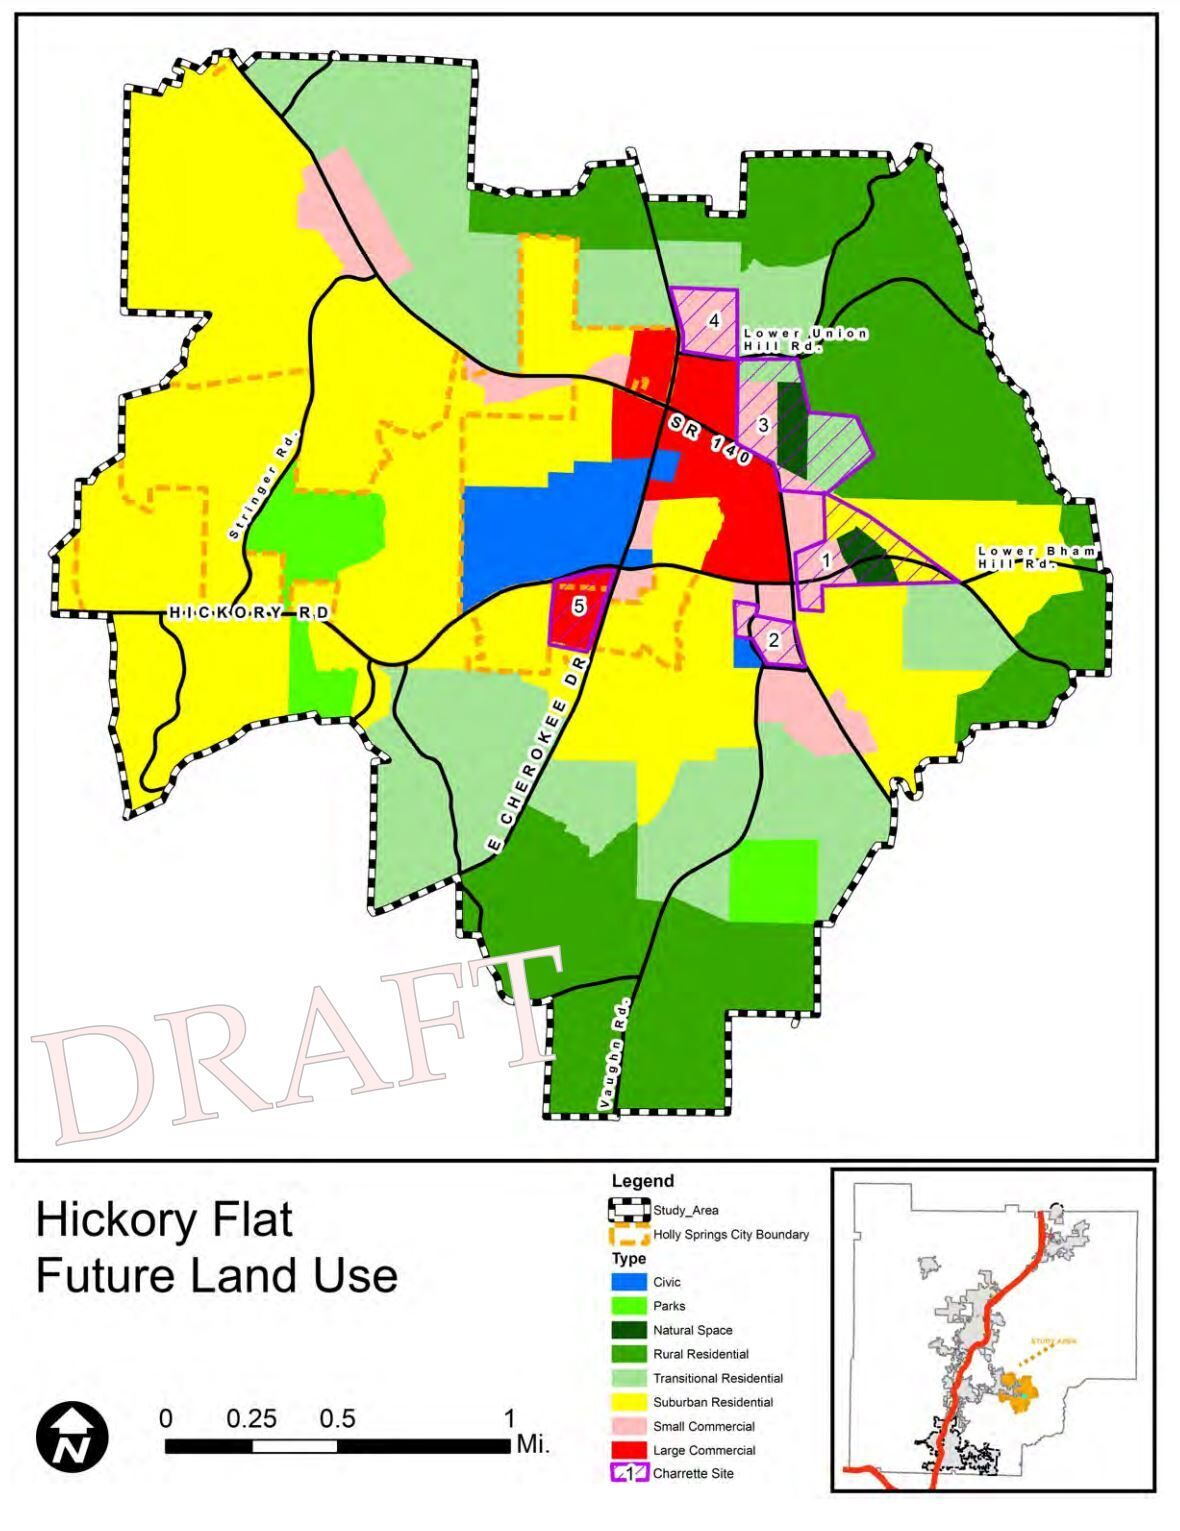 Hickory Flat future land use plan.JPG